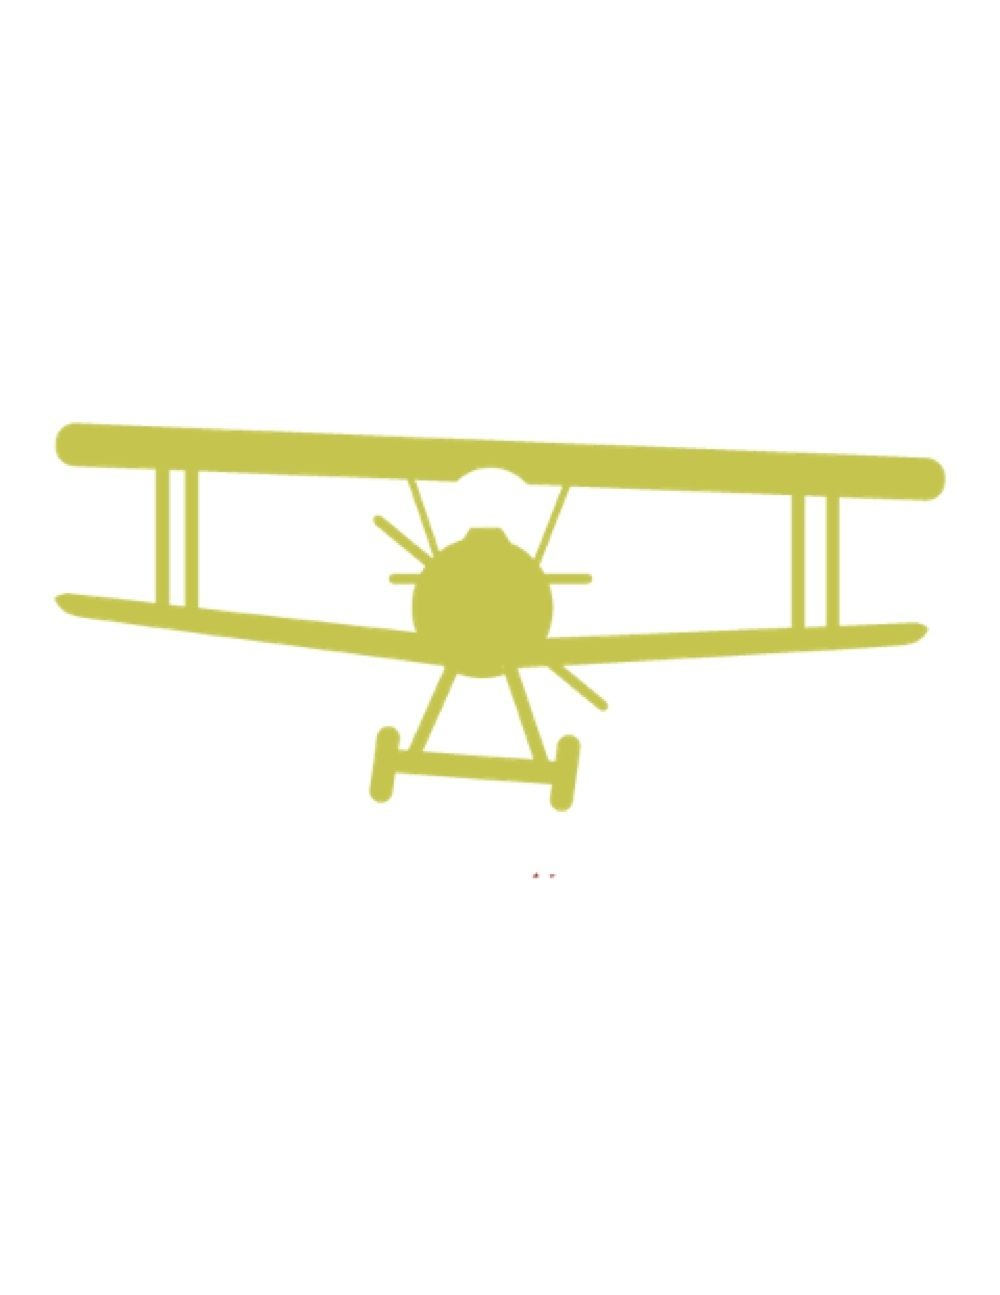 Free Air Themed Printables   Printables   Airplane Silhouette - Free Printable Airplane Template